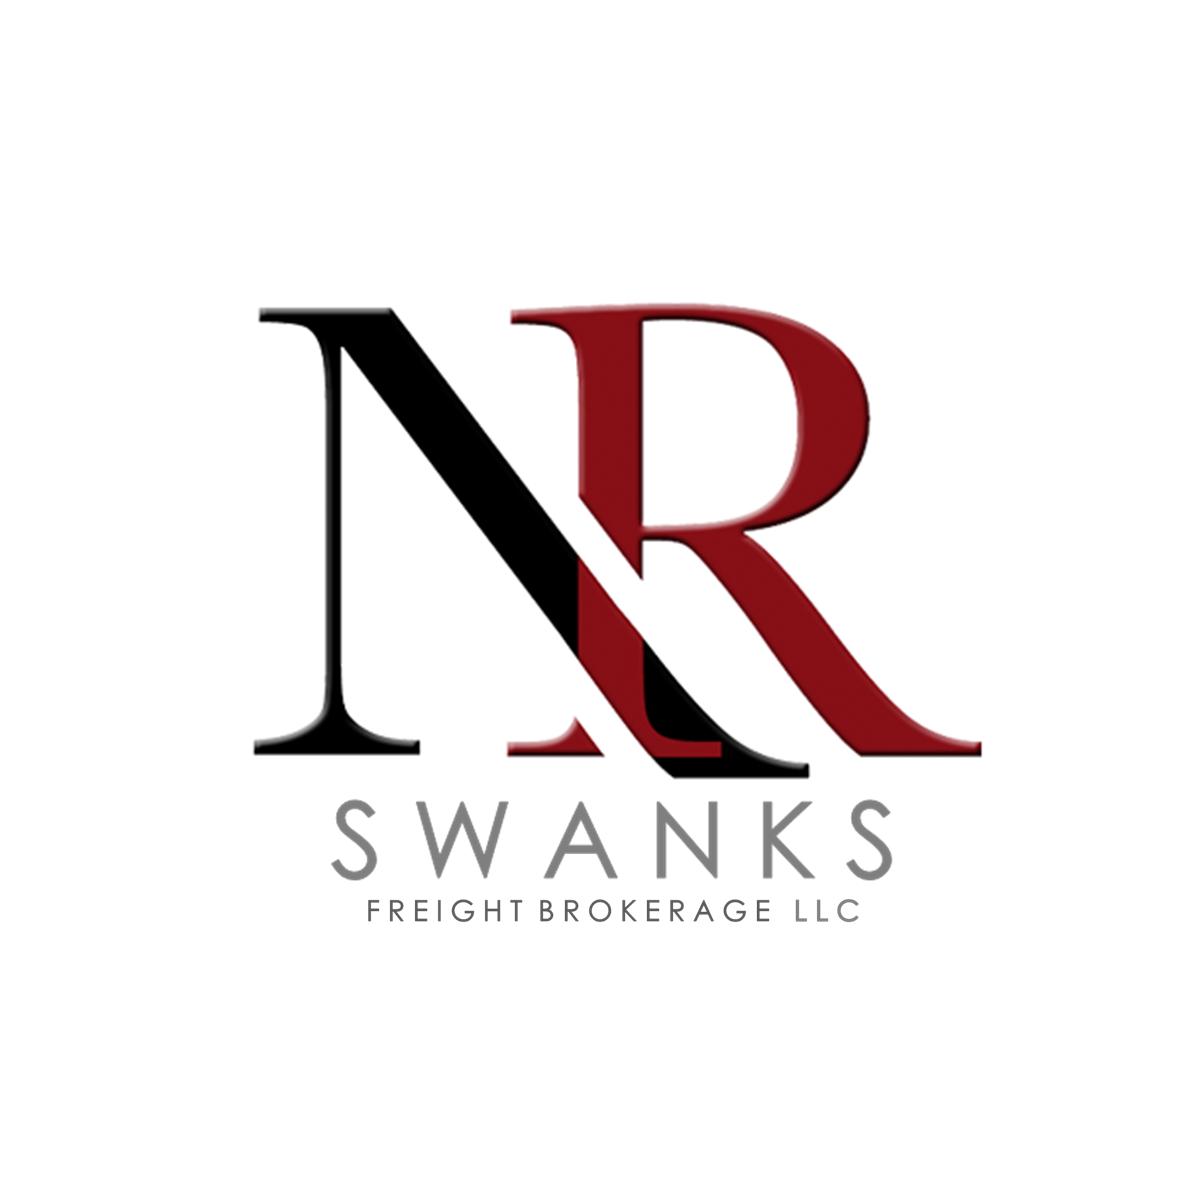 NR SWANKS FREIGHT BROKERAGE LLC